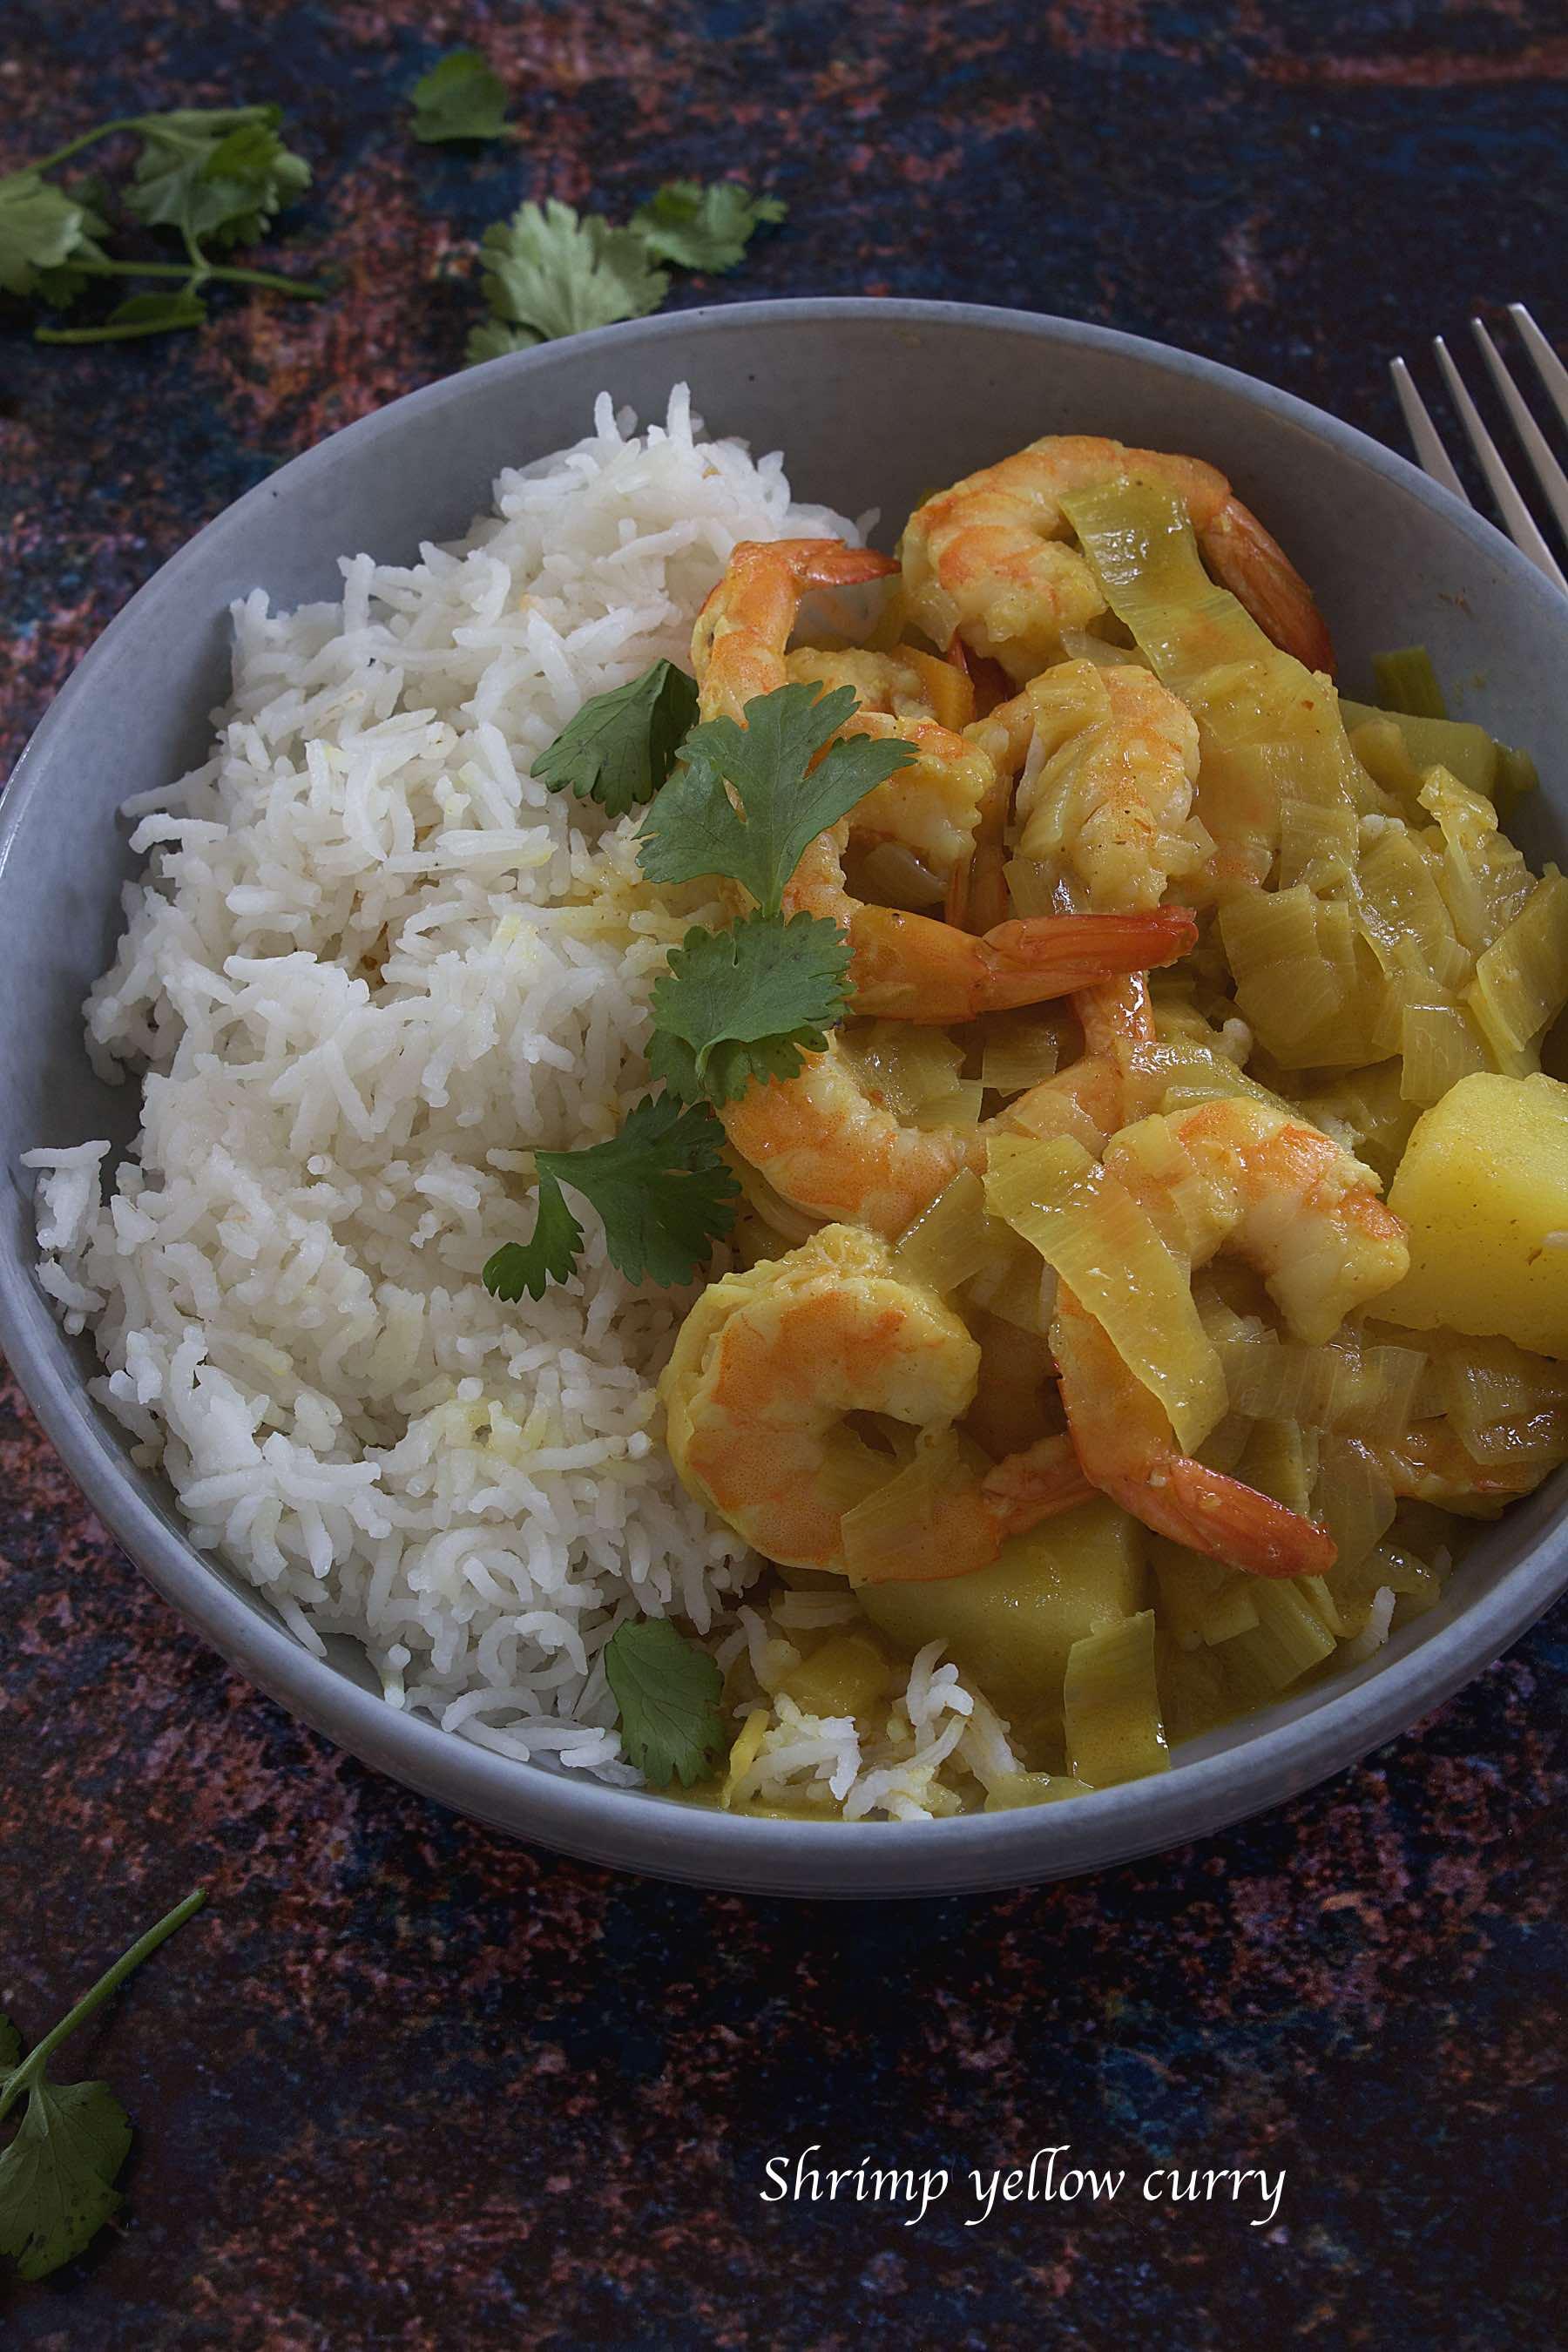 Shrimp yellow curry